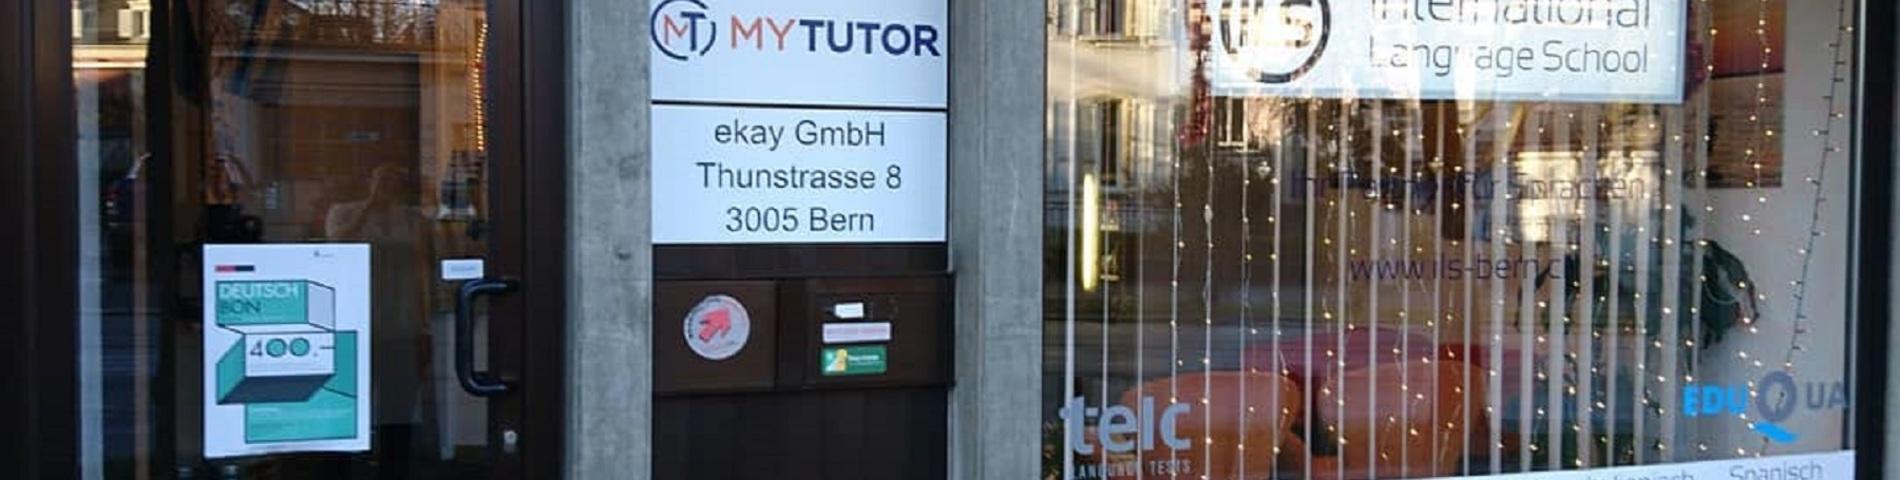 International Language School foto 1